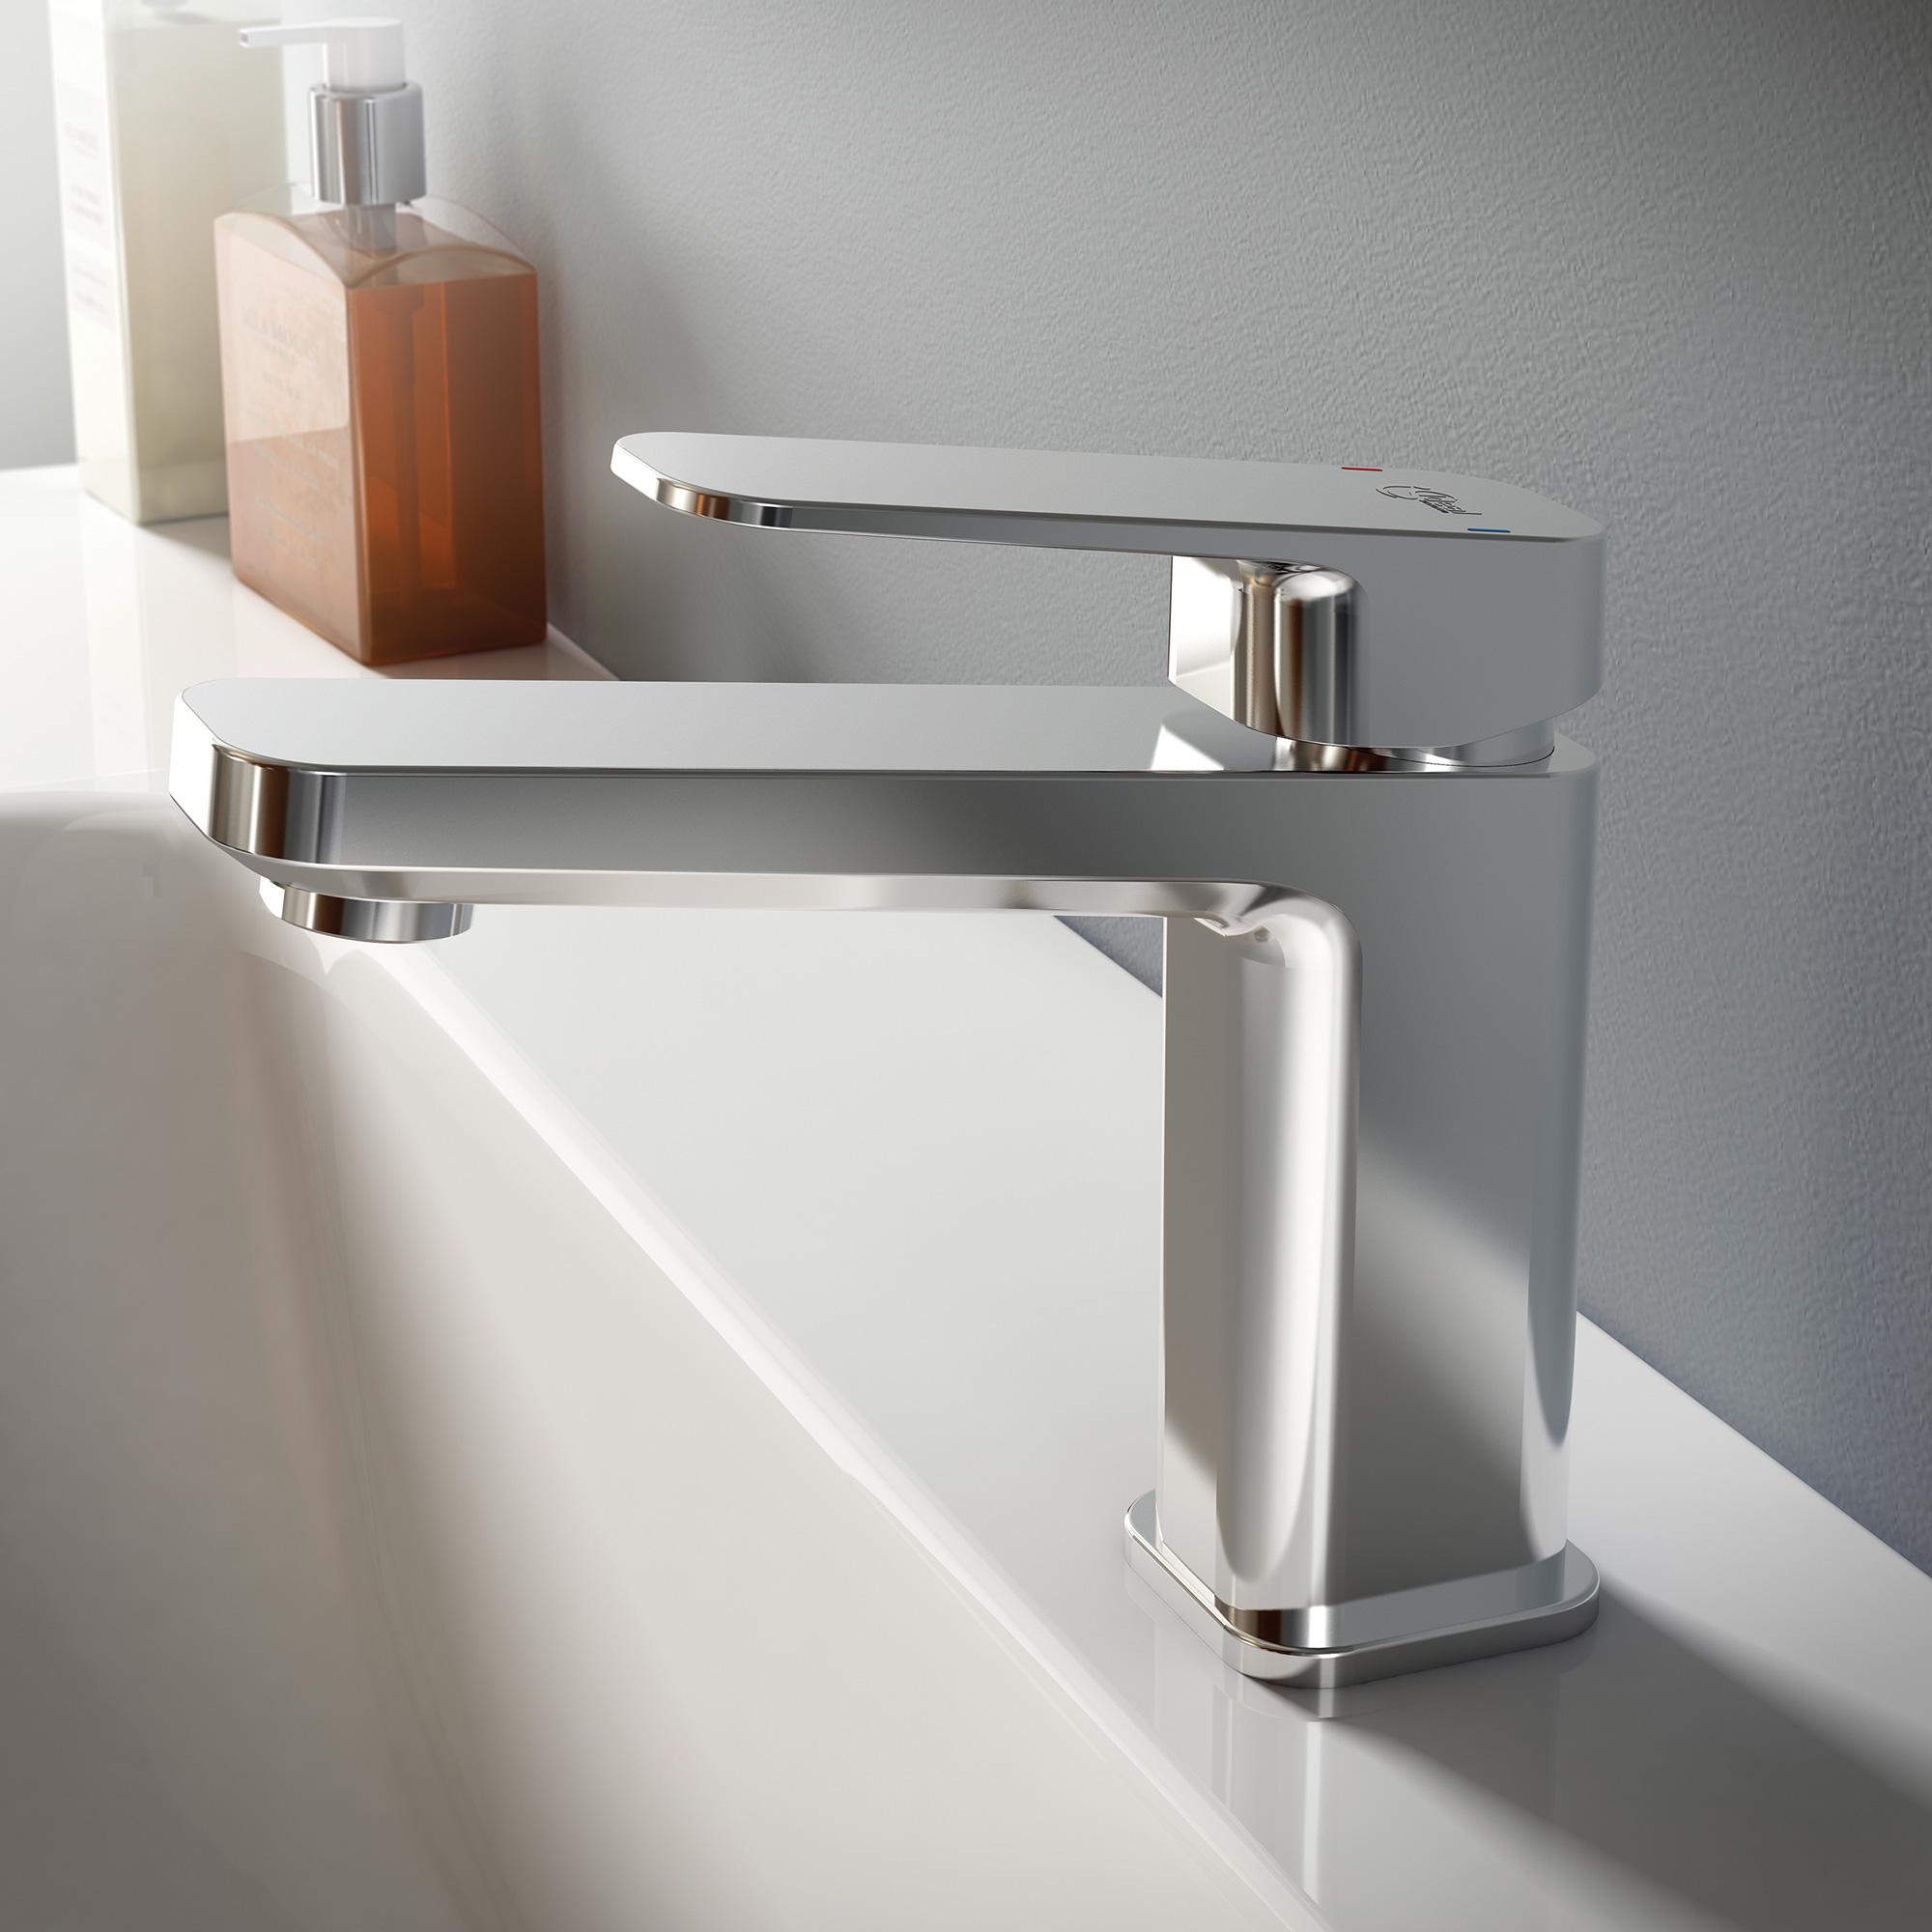 ideal standard tonic ii waschtischarmatur ohne ablaufgarnitur. Black Bedroom Furniture Sets. Home Design Ideas